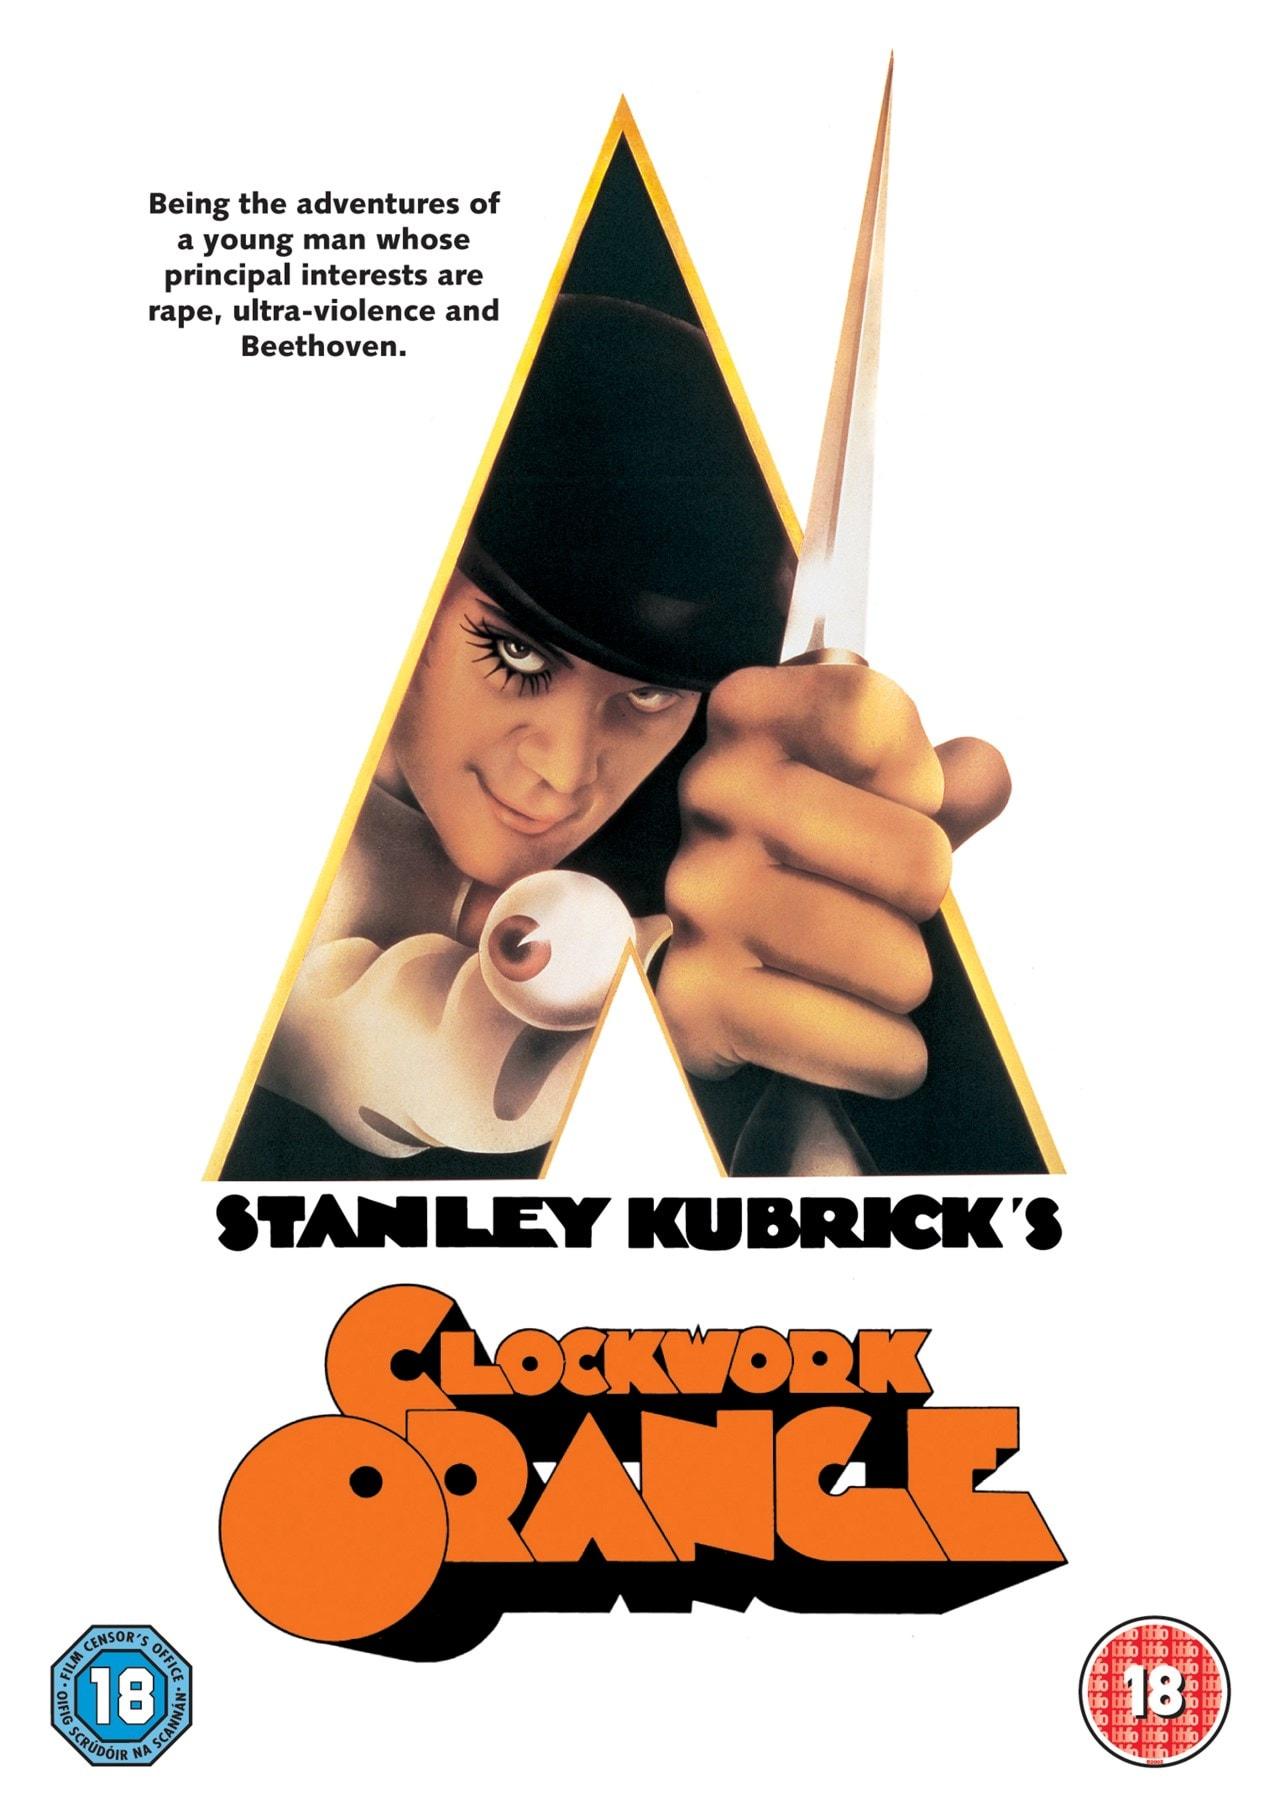 A Clockwork Orange | DVD | Free shipping over £20 | HMV Store